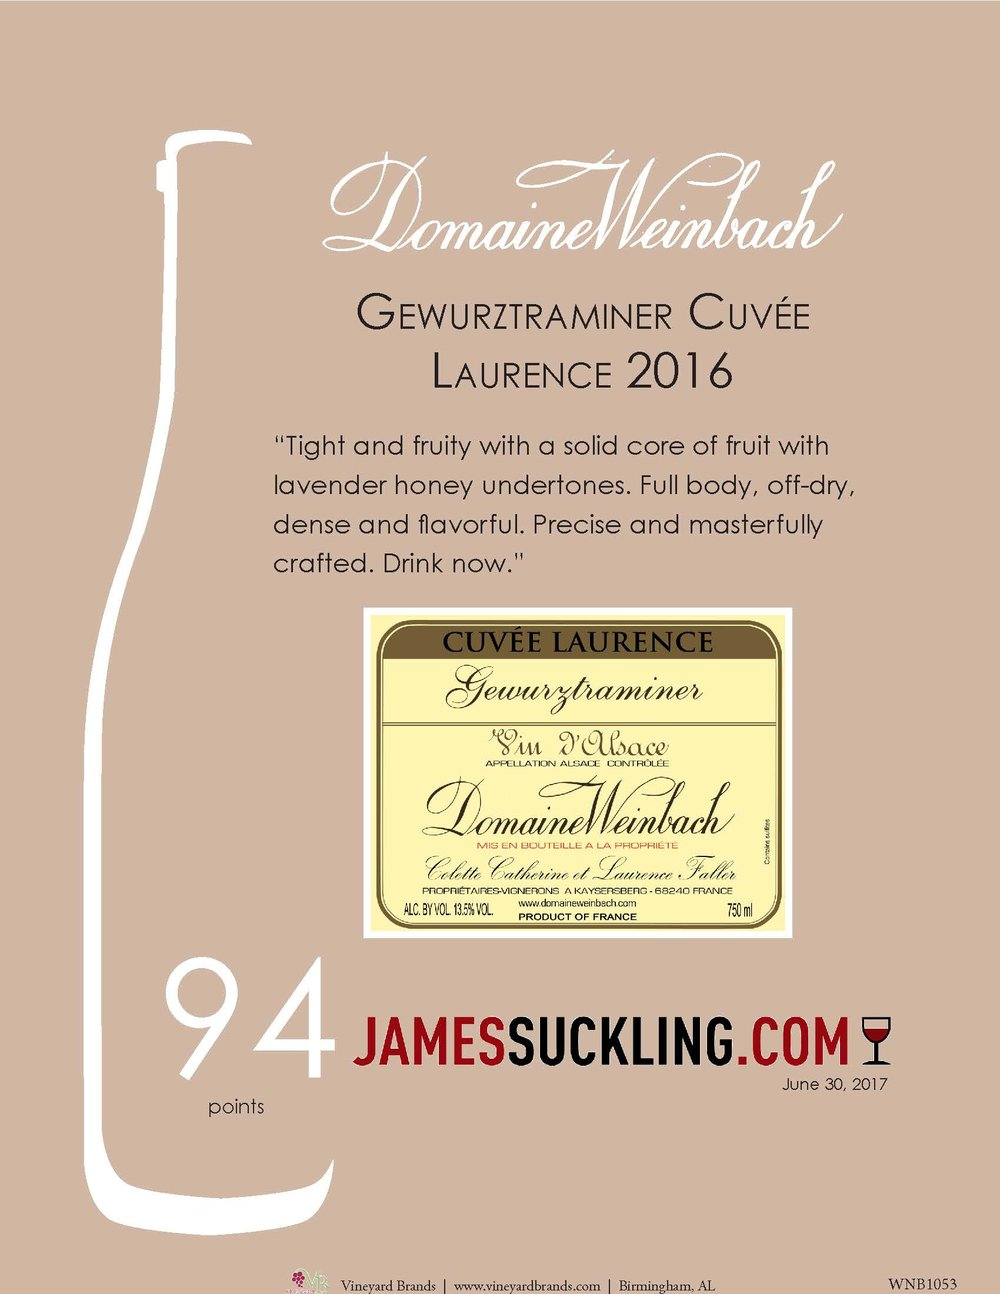 Weinbach Gewurztraminer Cuvee Laurence 2016.jpg